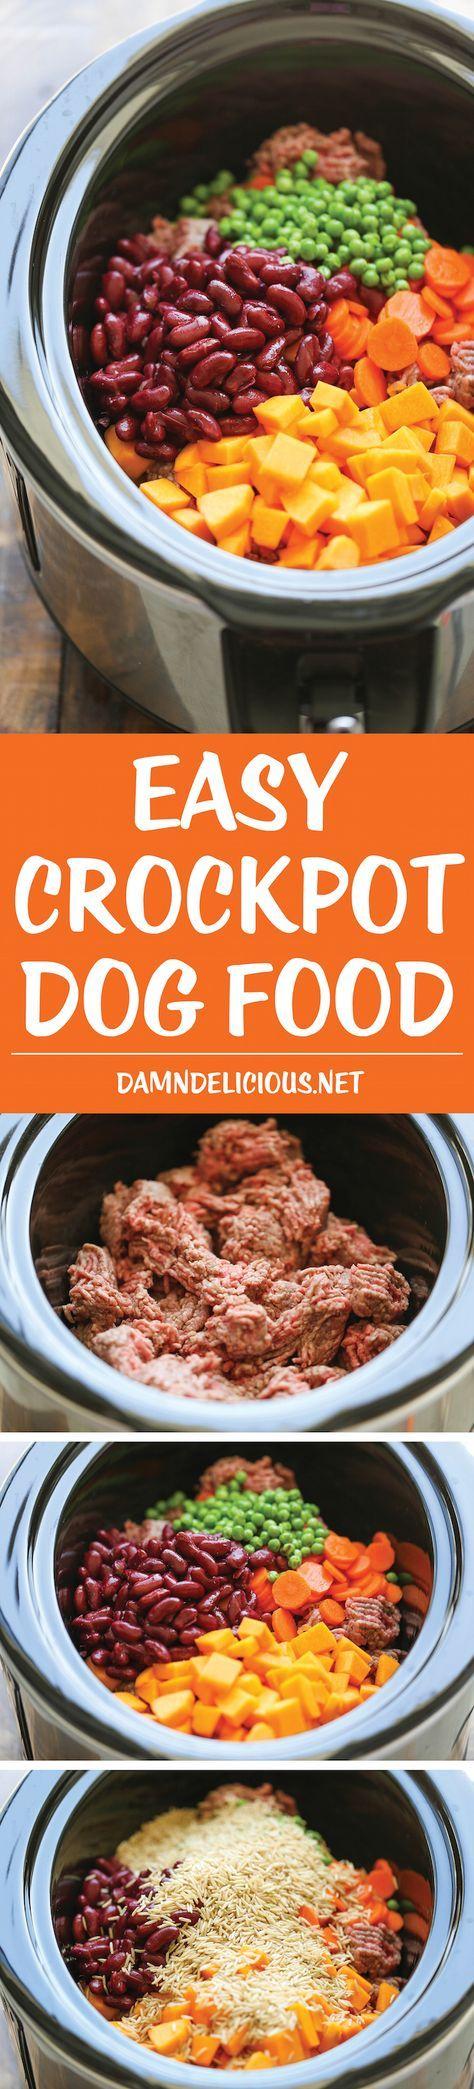 Cheapest Price For Orijen Dog Food